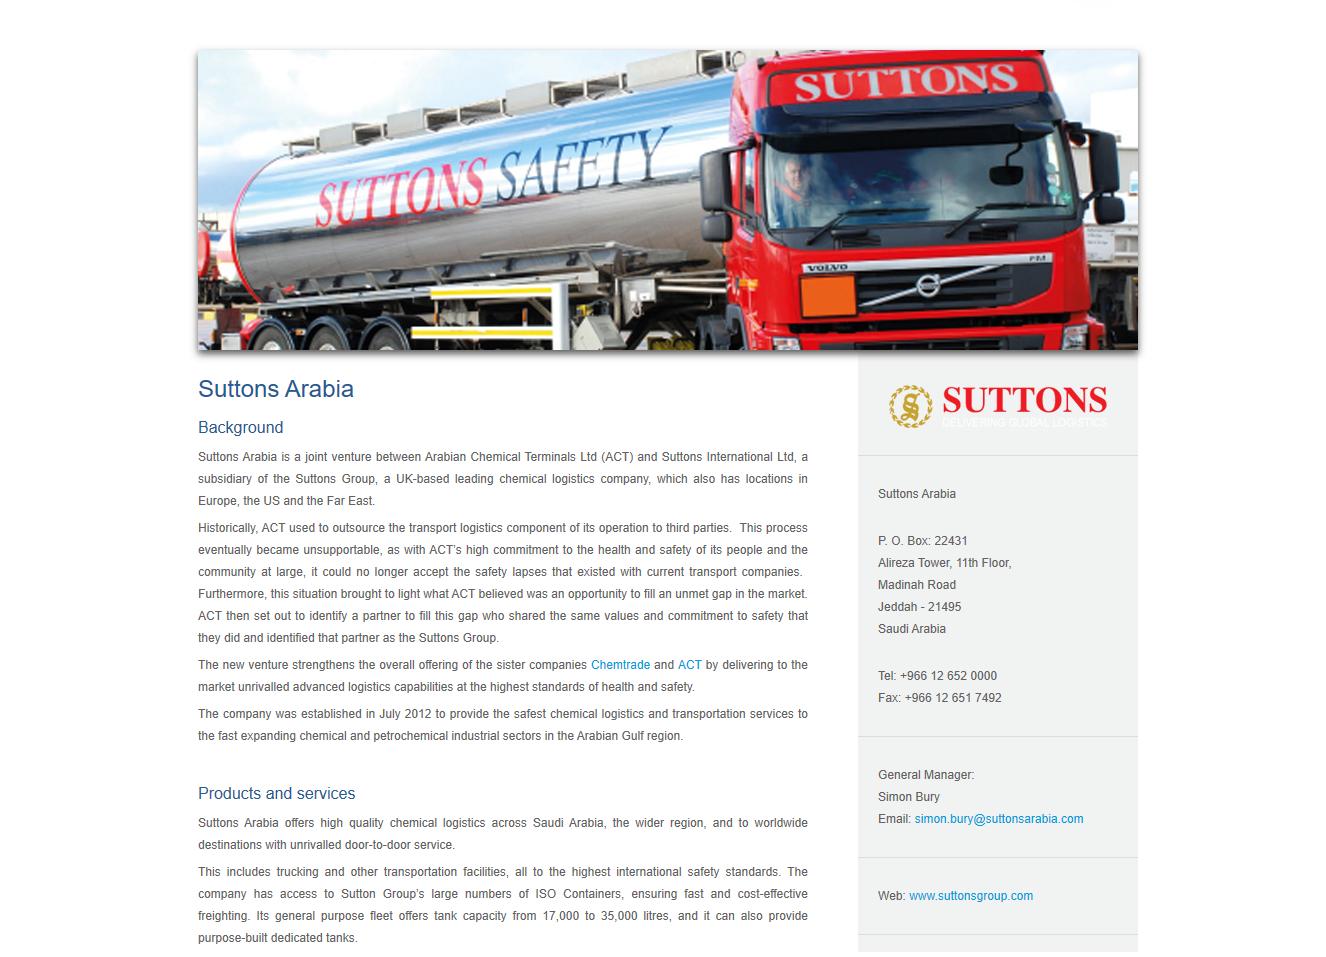 Suttons Arabia Logistics - web copy